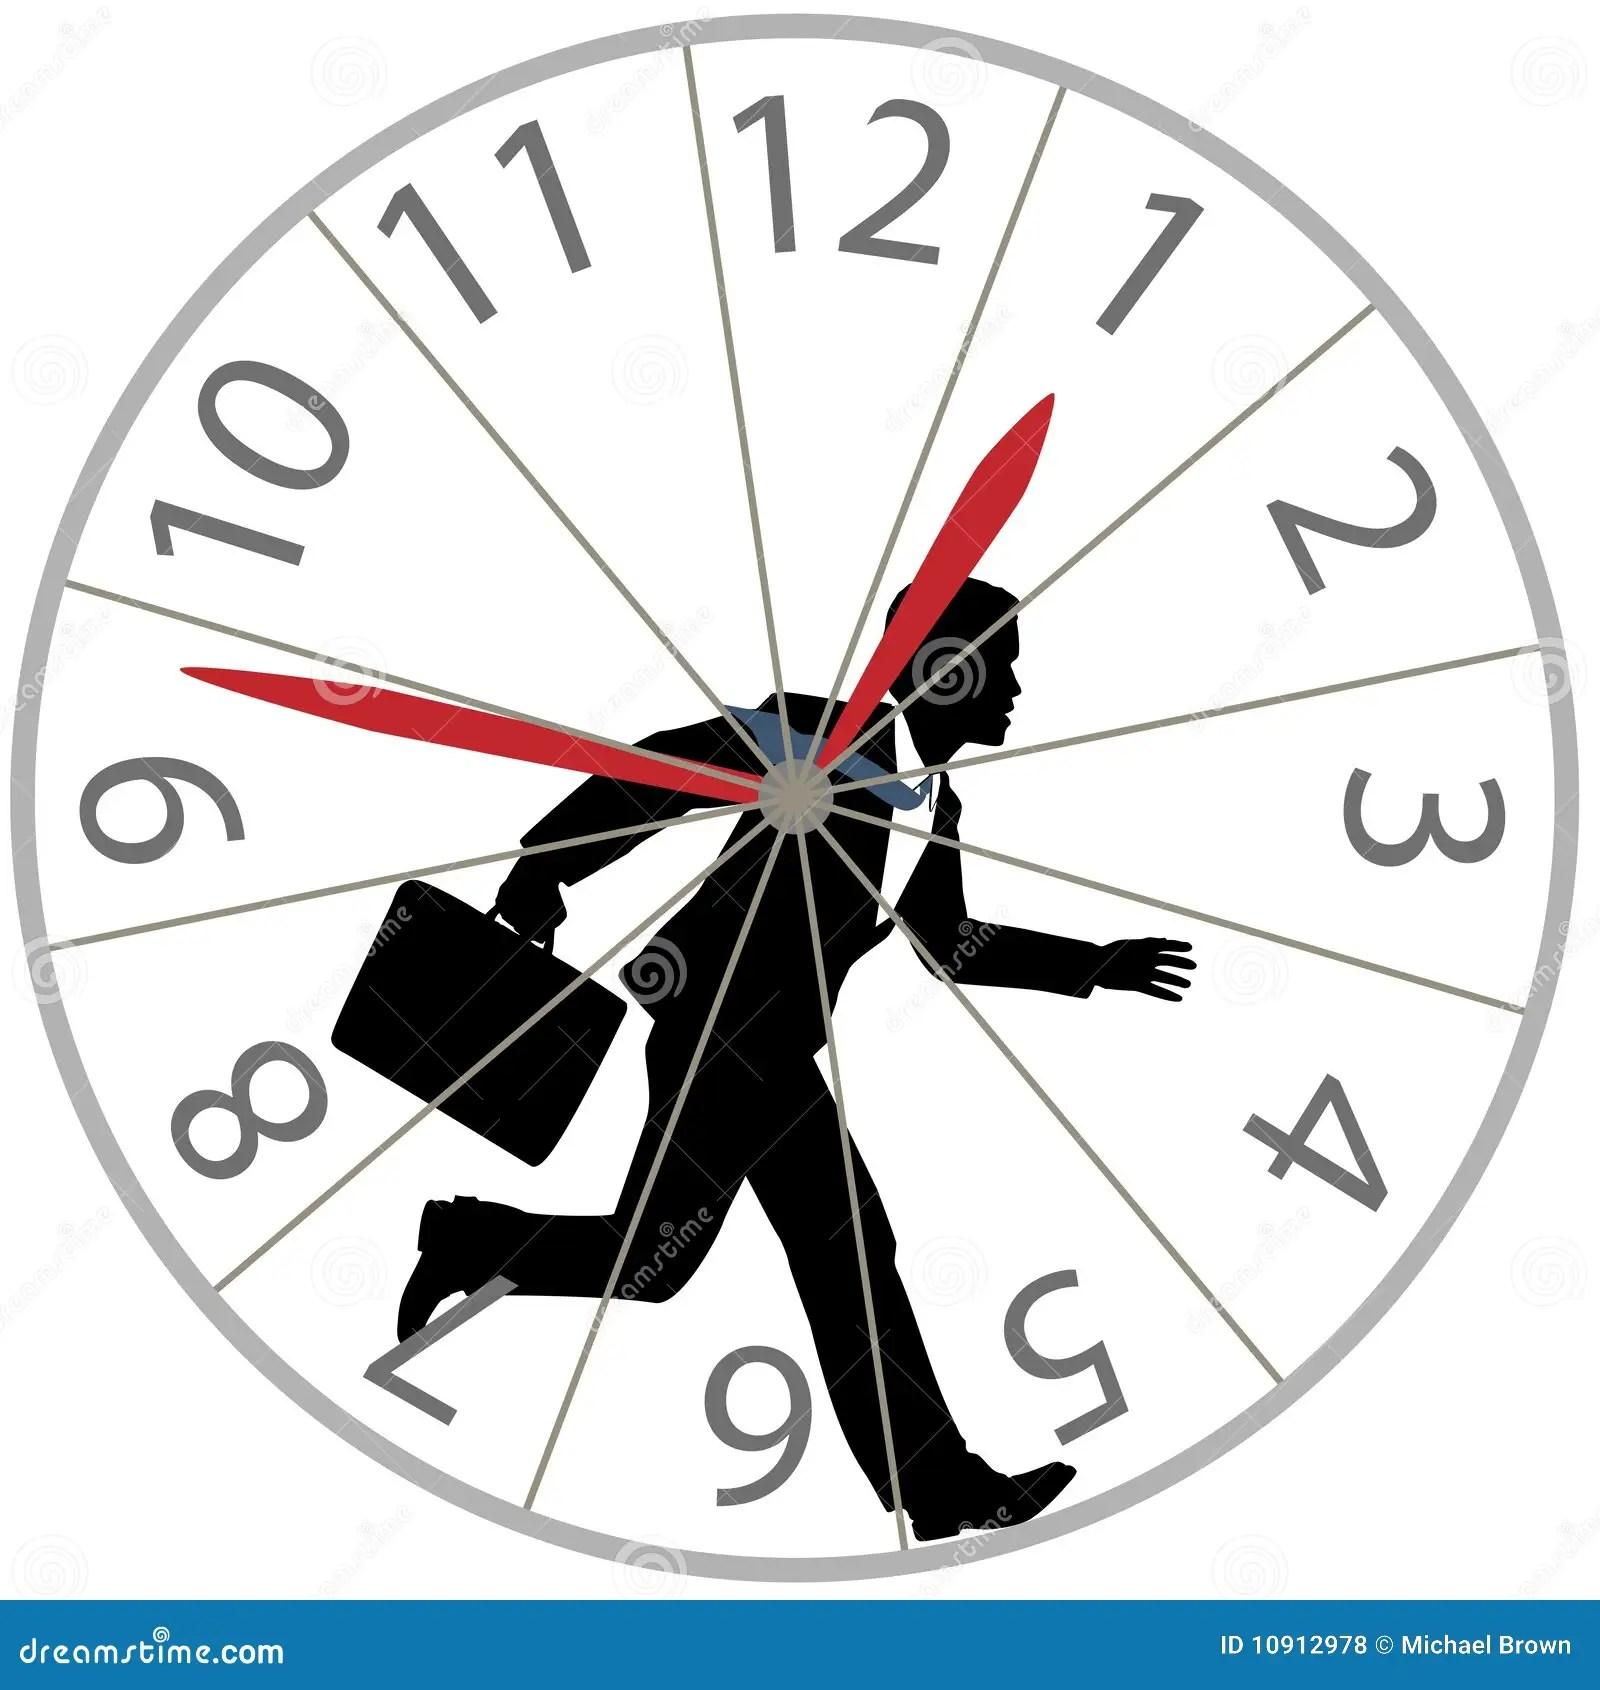 Business Man Runs Rat Race In Hamster Wheel Clock Stock